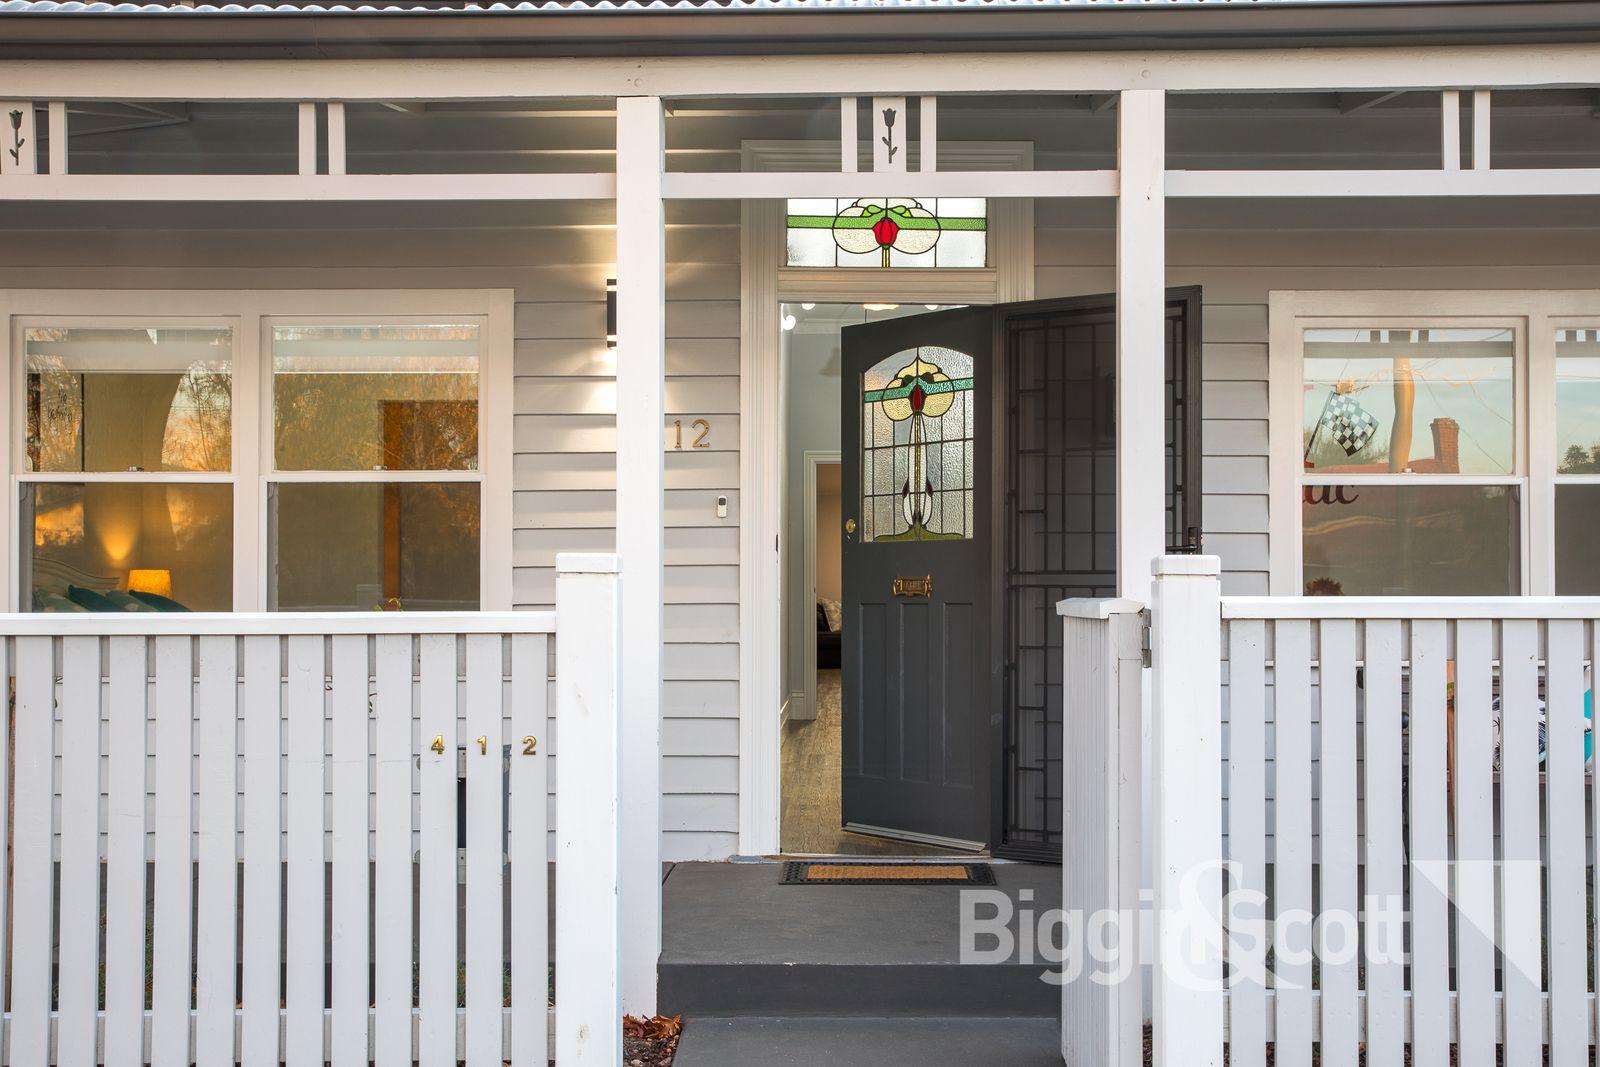 412 Ripon Street South, Ballarat Central VIC 3350, Image 0